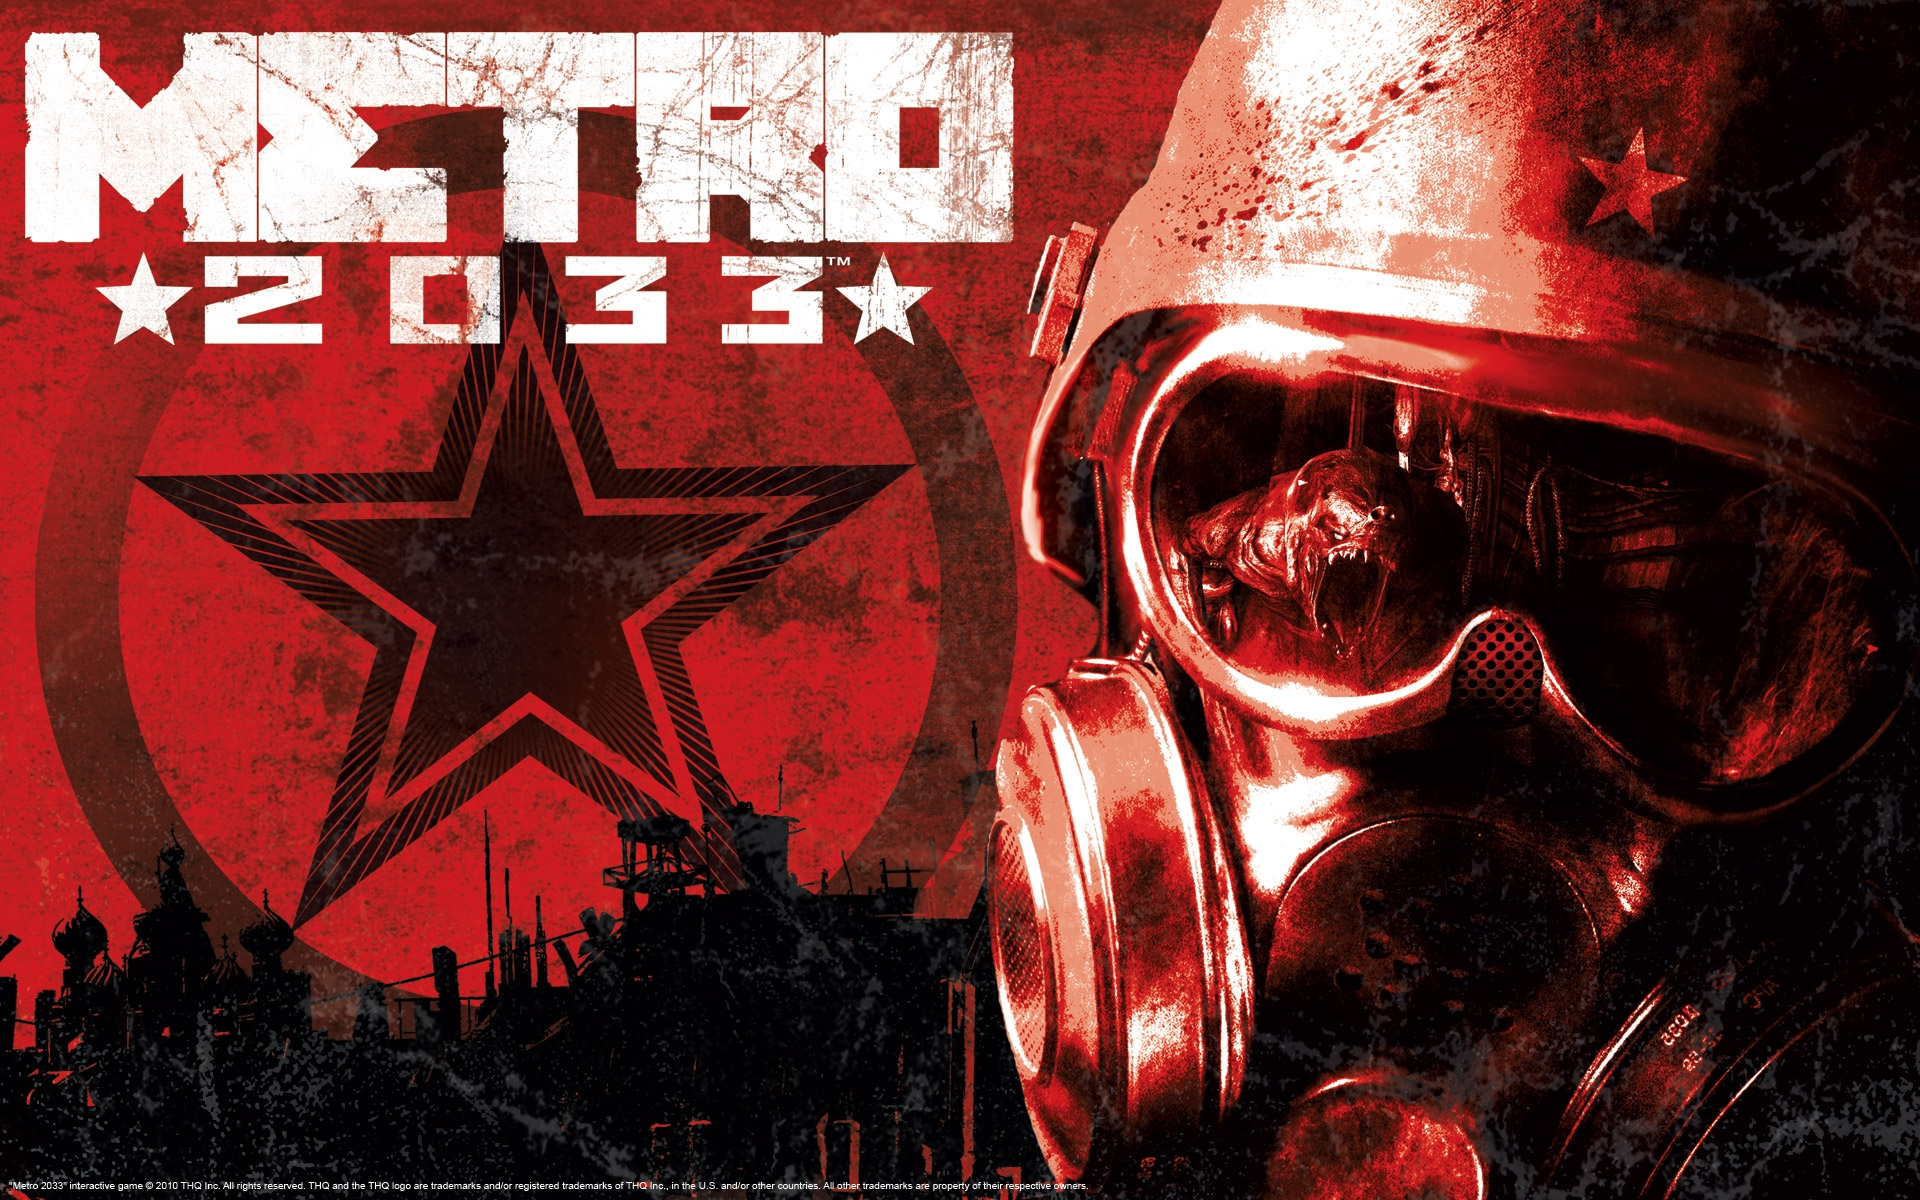 Metro 2033 Wallpaper 1920X1080 1920x1200